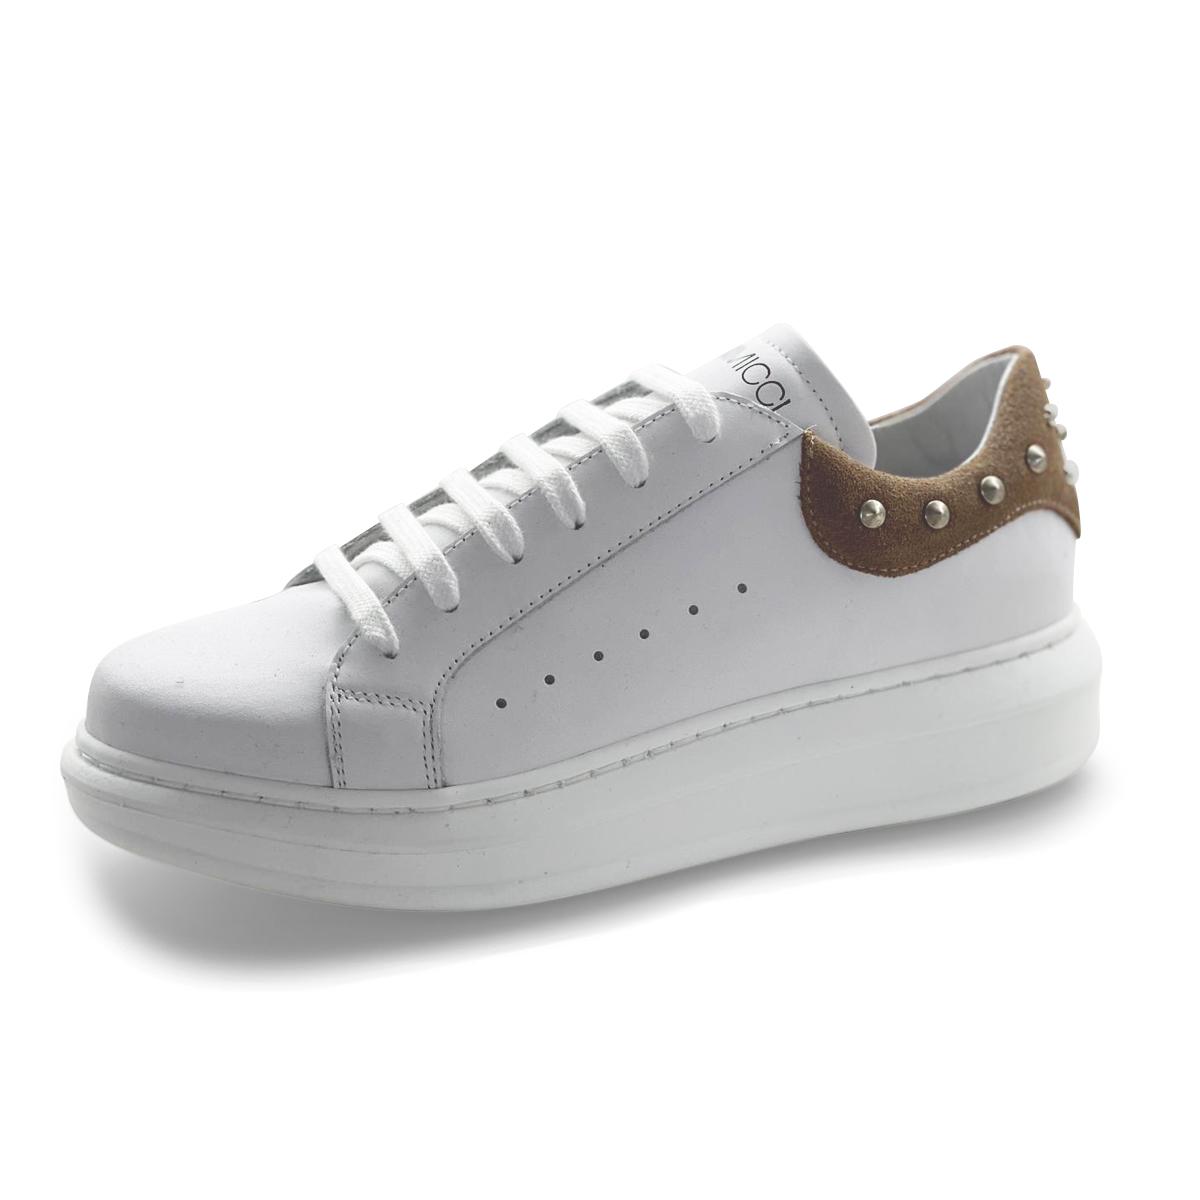 boho chic sneakers sealafootwear